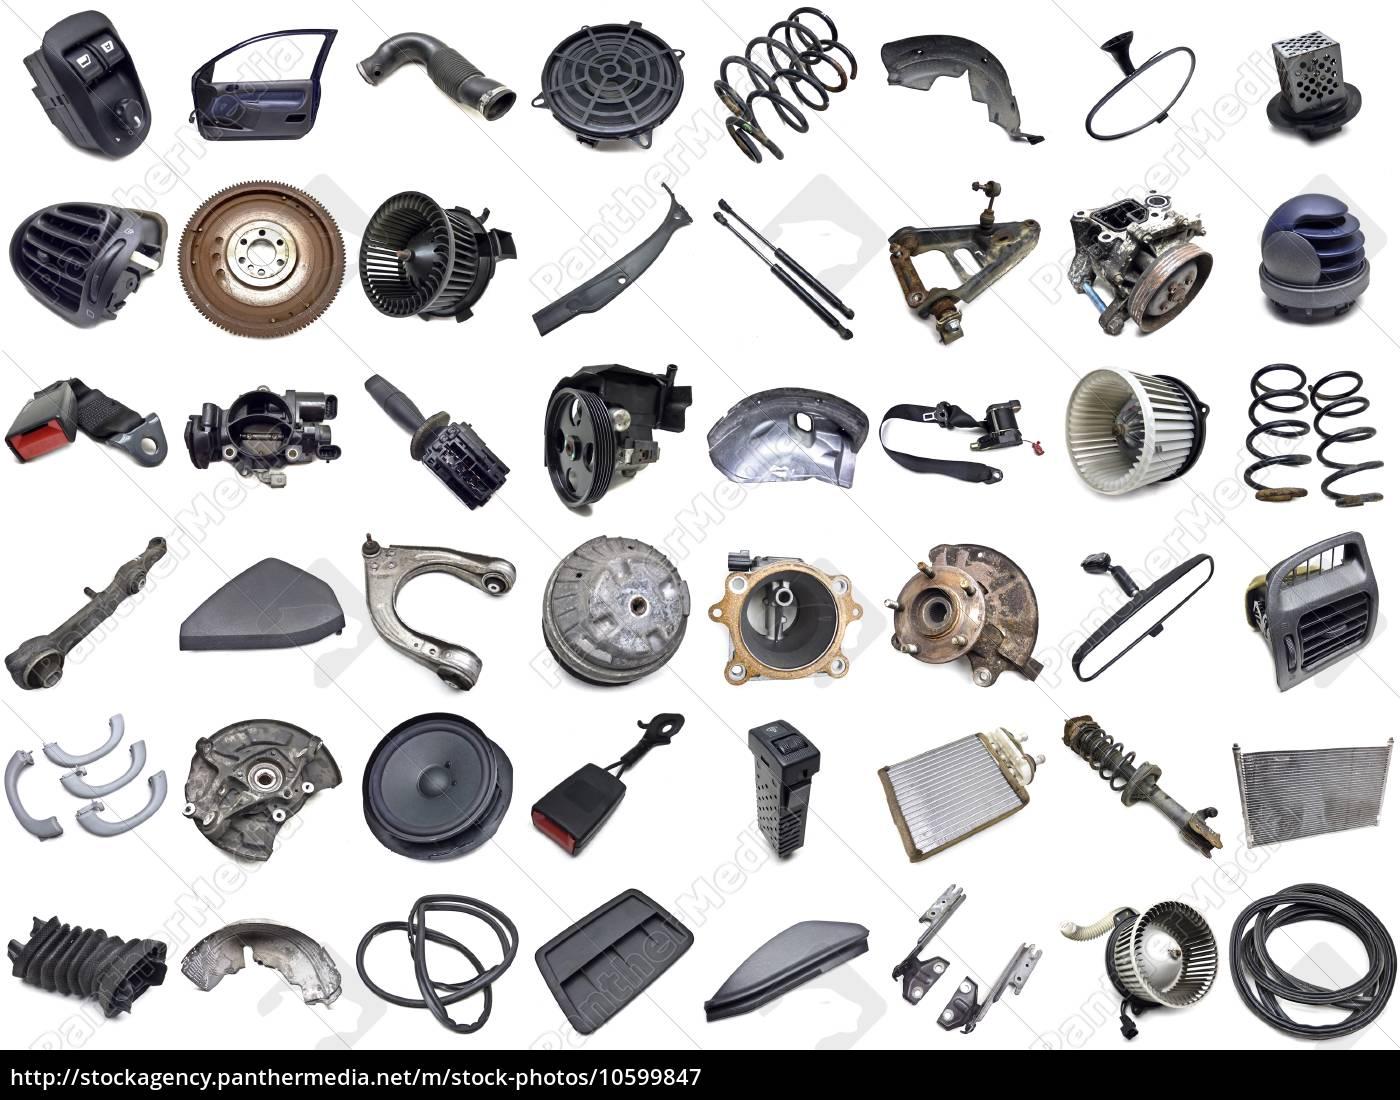 Autoteile - Lizenzfreies Bild - #10599847 - Bildagentur PantherMedia